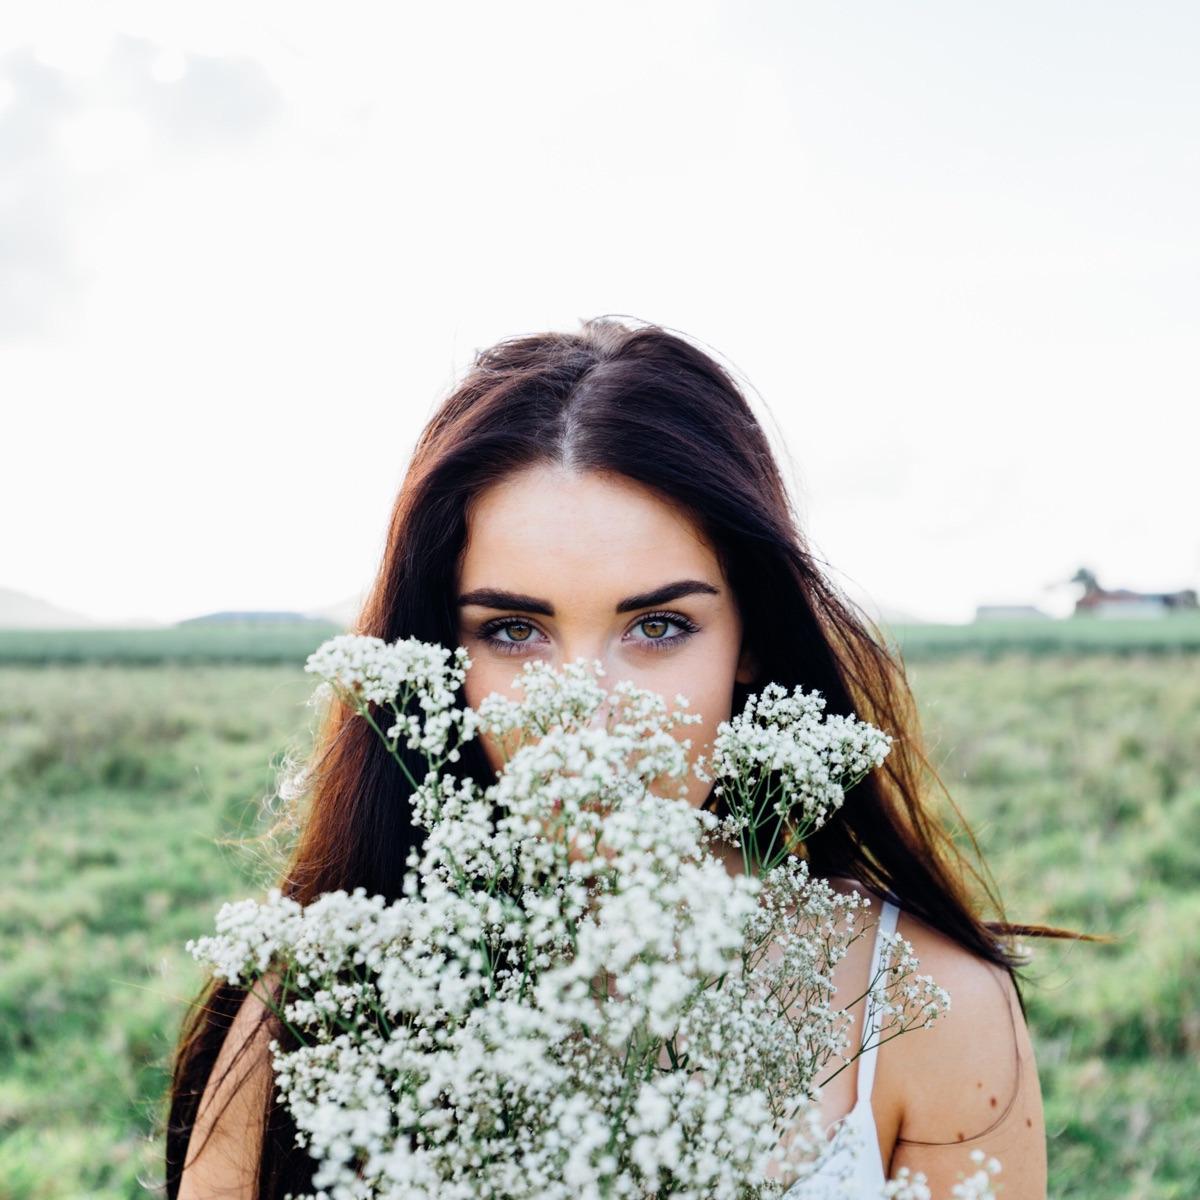 serendipia_beauty (@serendipia_beauty) Cover Image